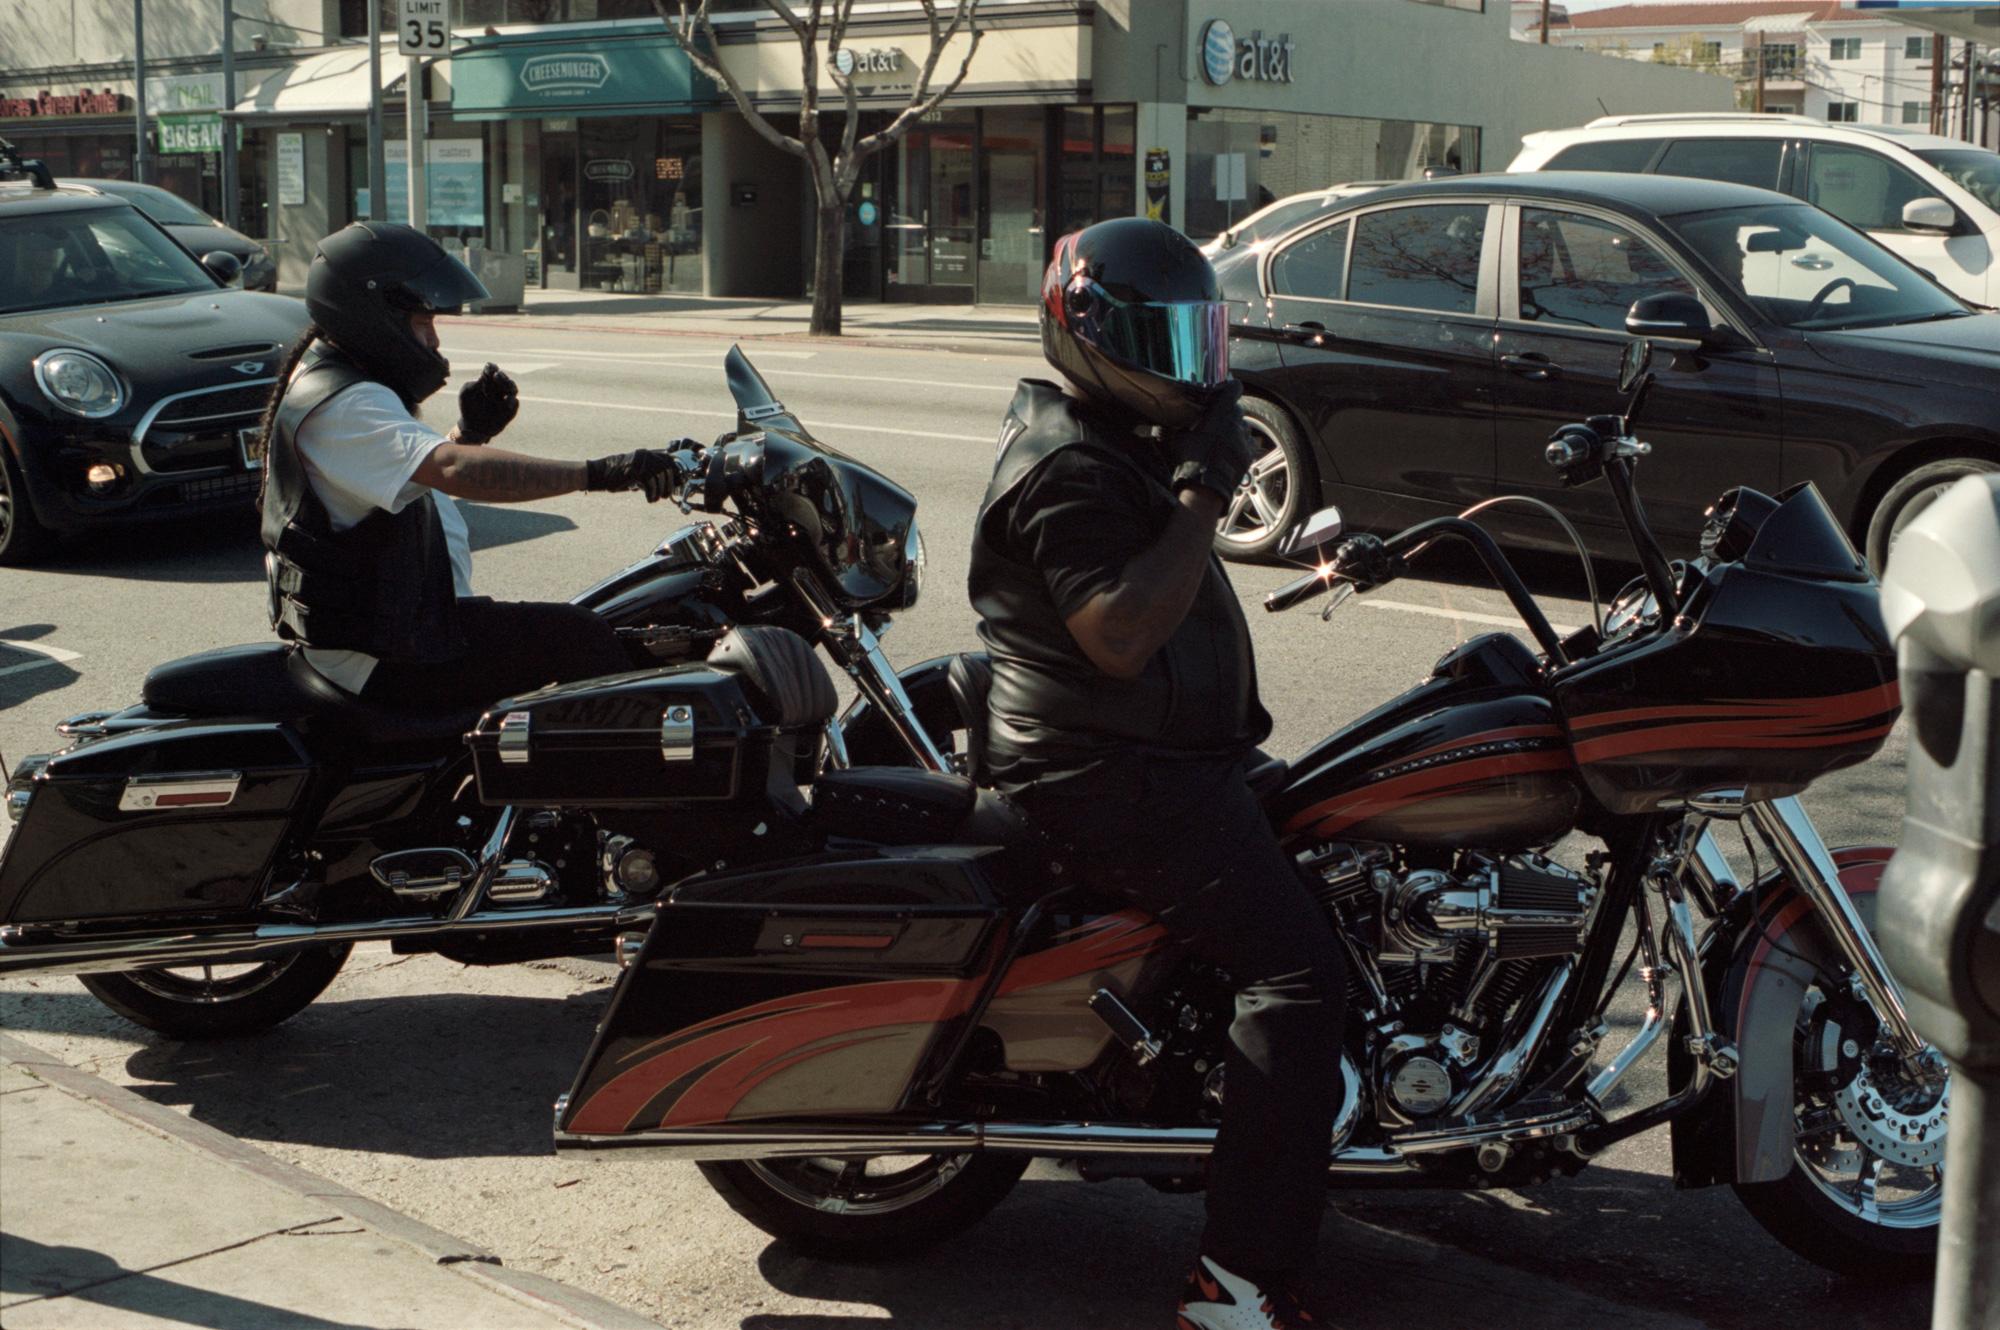 Bikers, 3rd Street, LA, Omg Your English, Photography By Ioannis Koussertari